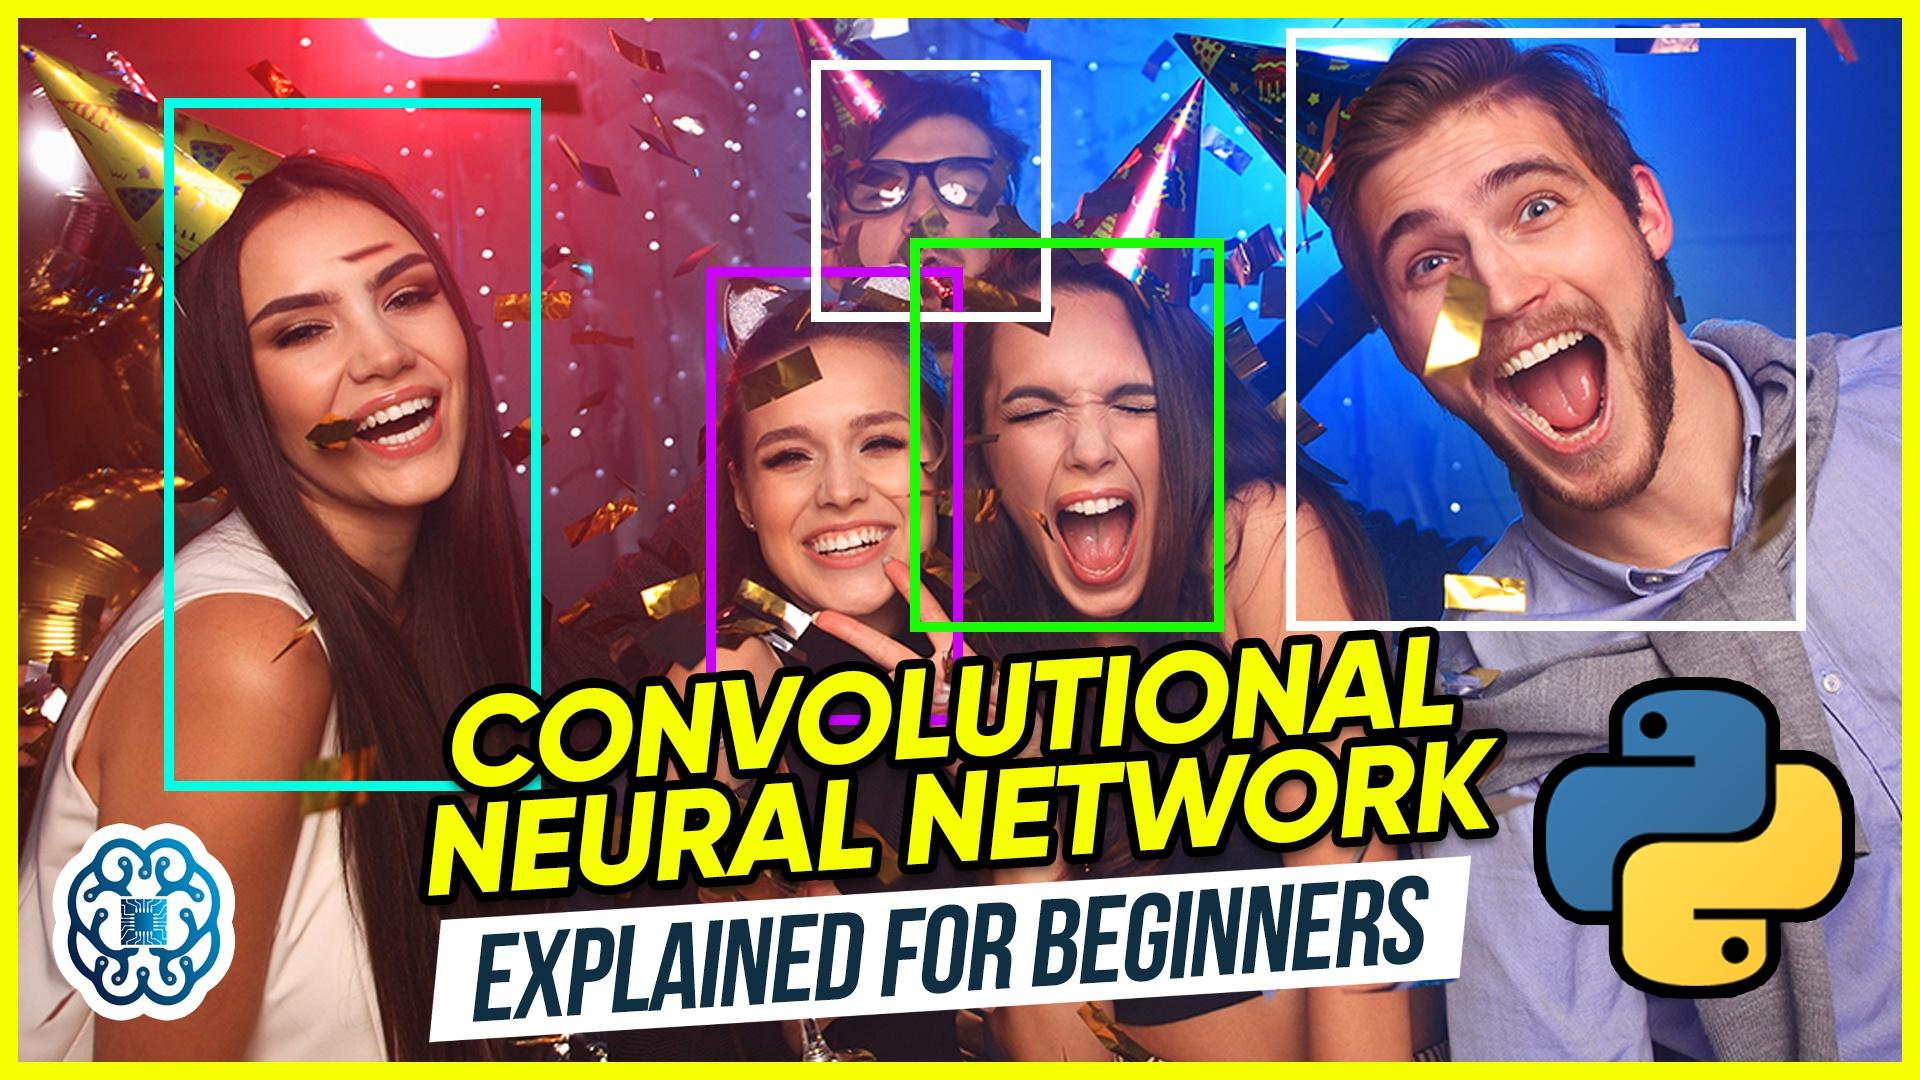 Convolutional Neural Networks Explained for Beginners